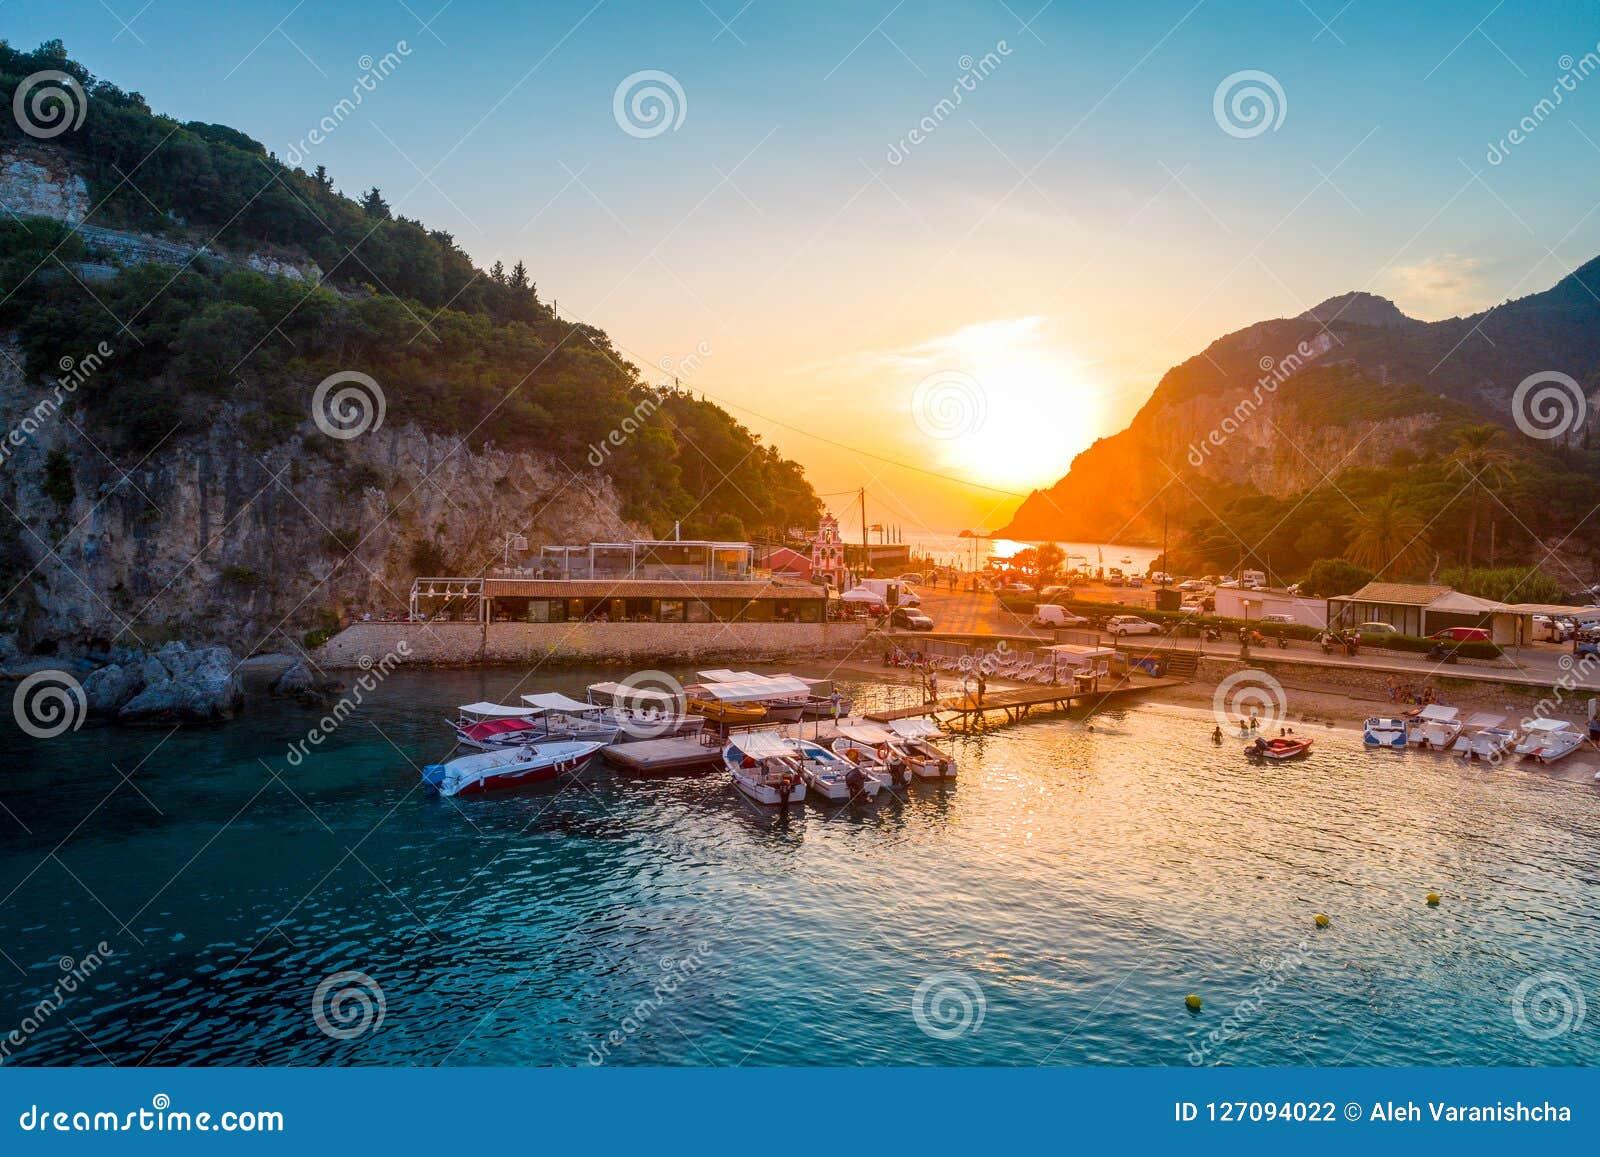 Baia di Paleokastritsa su Corfù, arcipelago ionico, Grecia